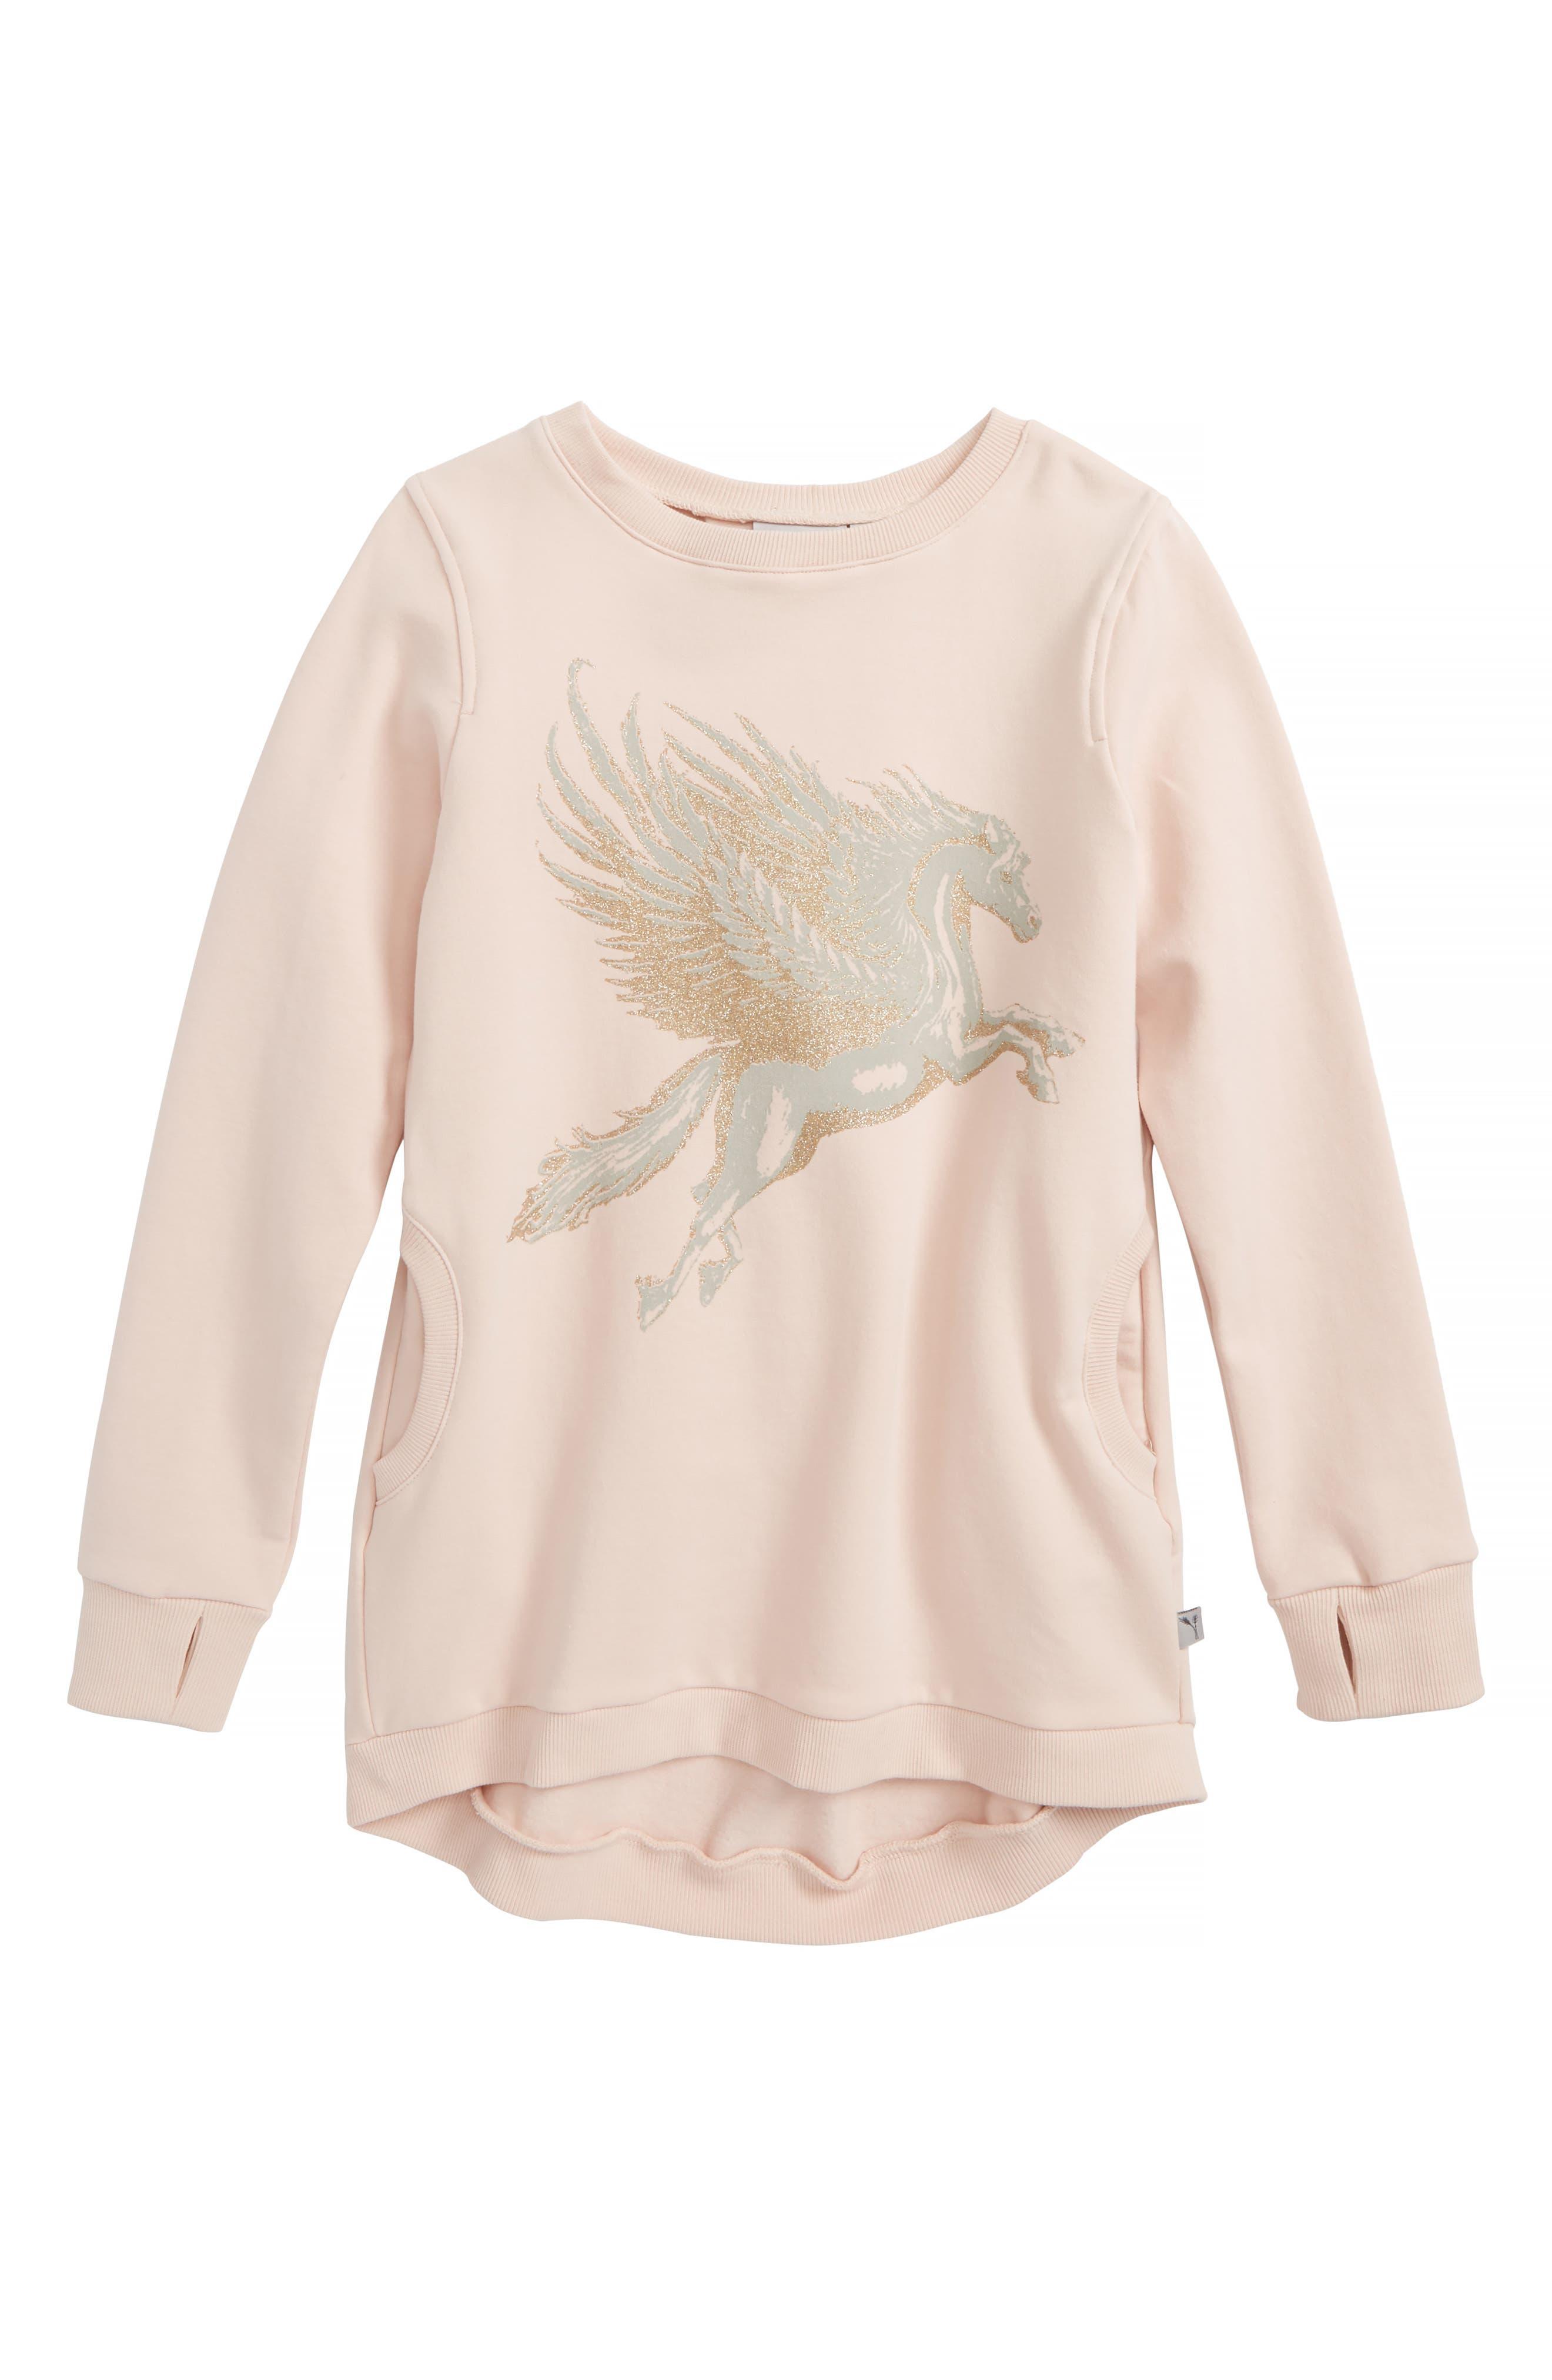 Glitter Graphic Sweatshirt,                             Main thumbnail 1, color,                             2400 Powder